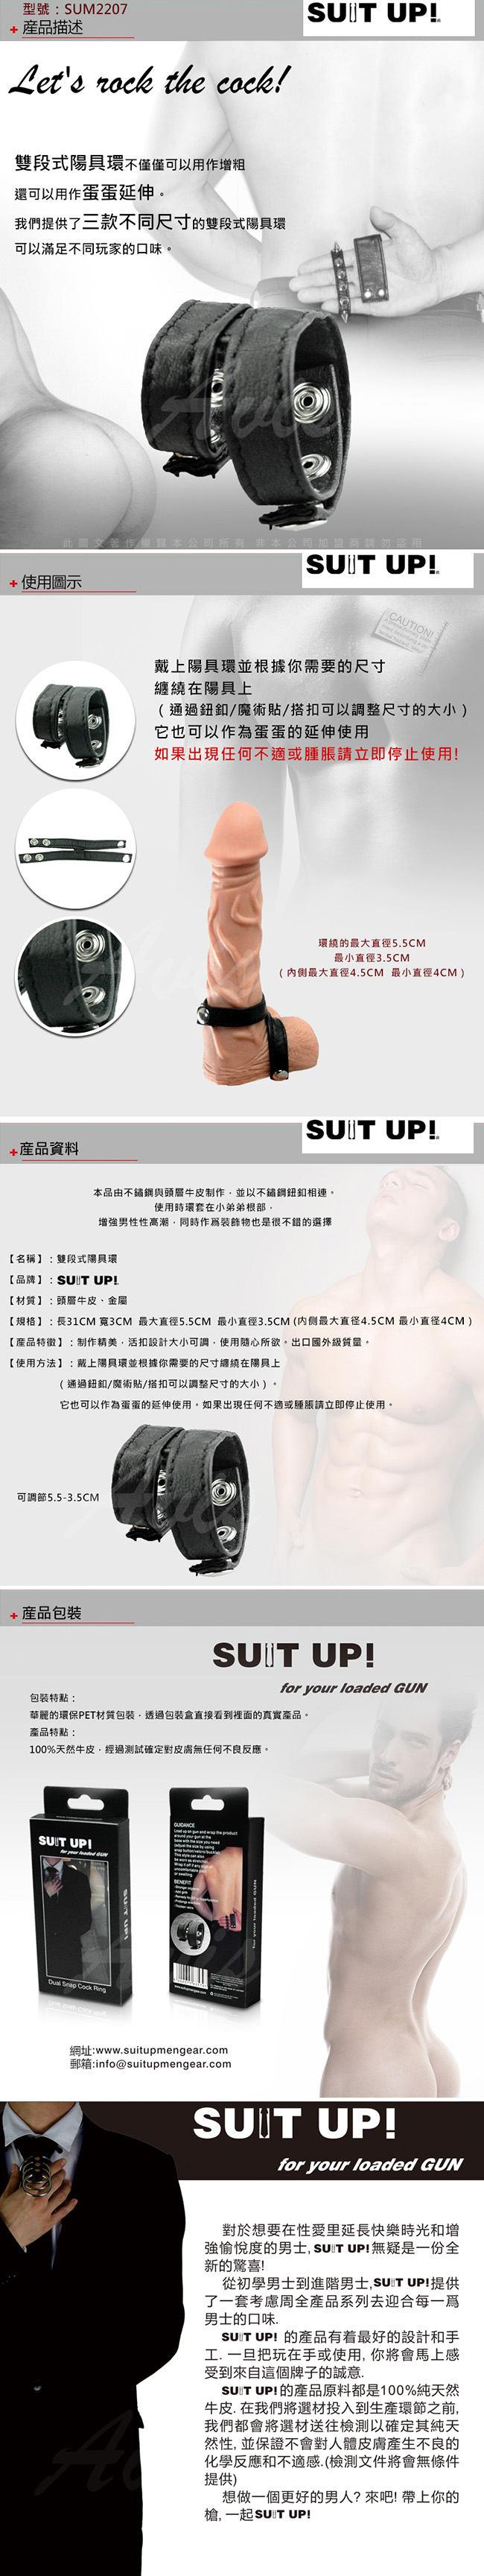 SUIT UP! SM情趣 雙段式陽具環